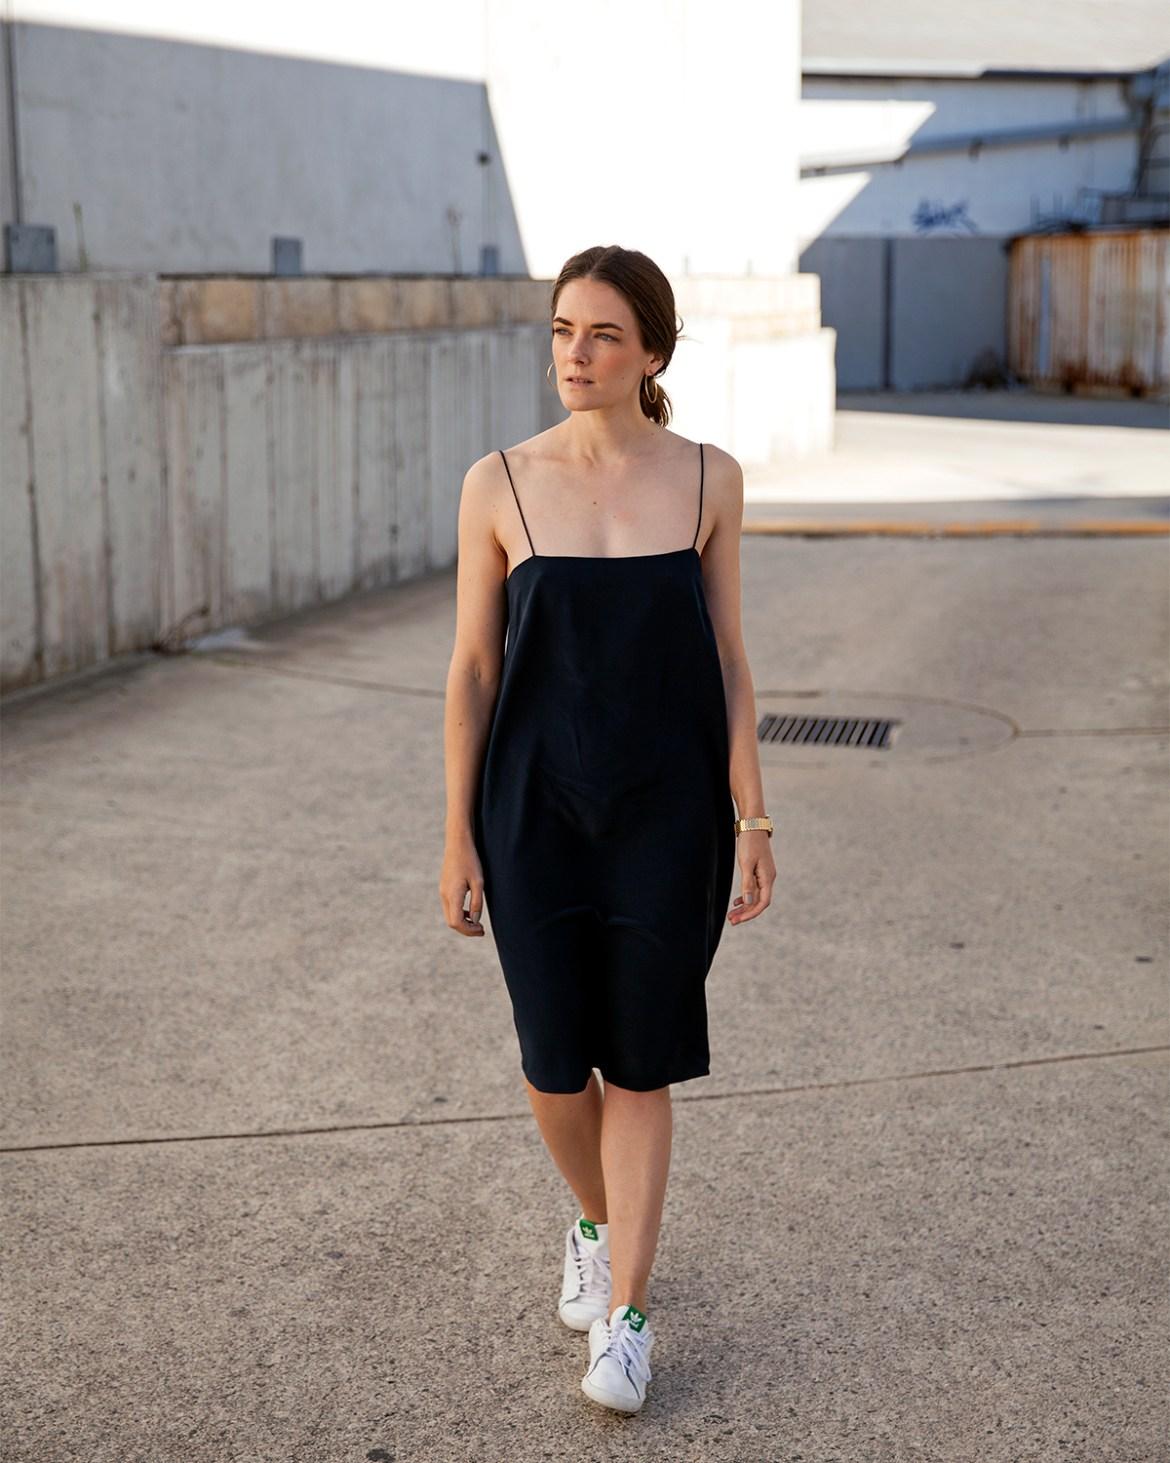 Ginia RTW silk slip dress worn by Inspiring Wit fashion blogger Jenelle Witty.